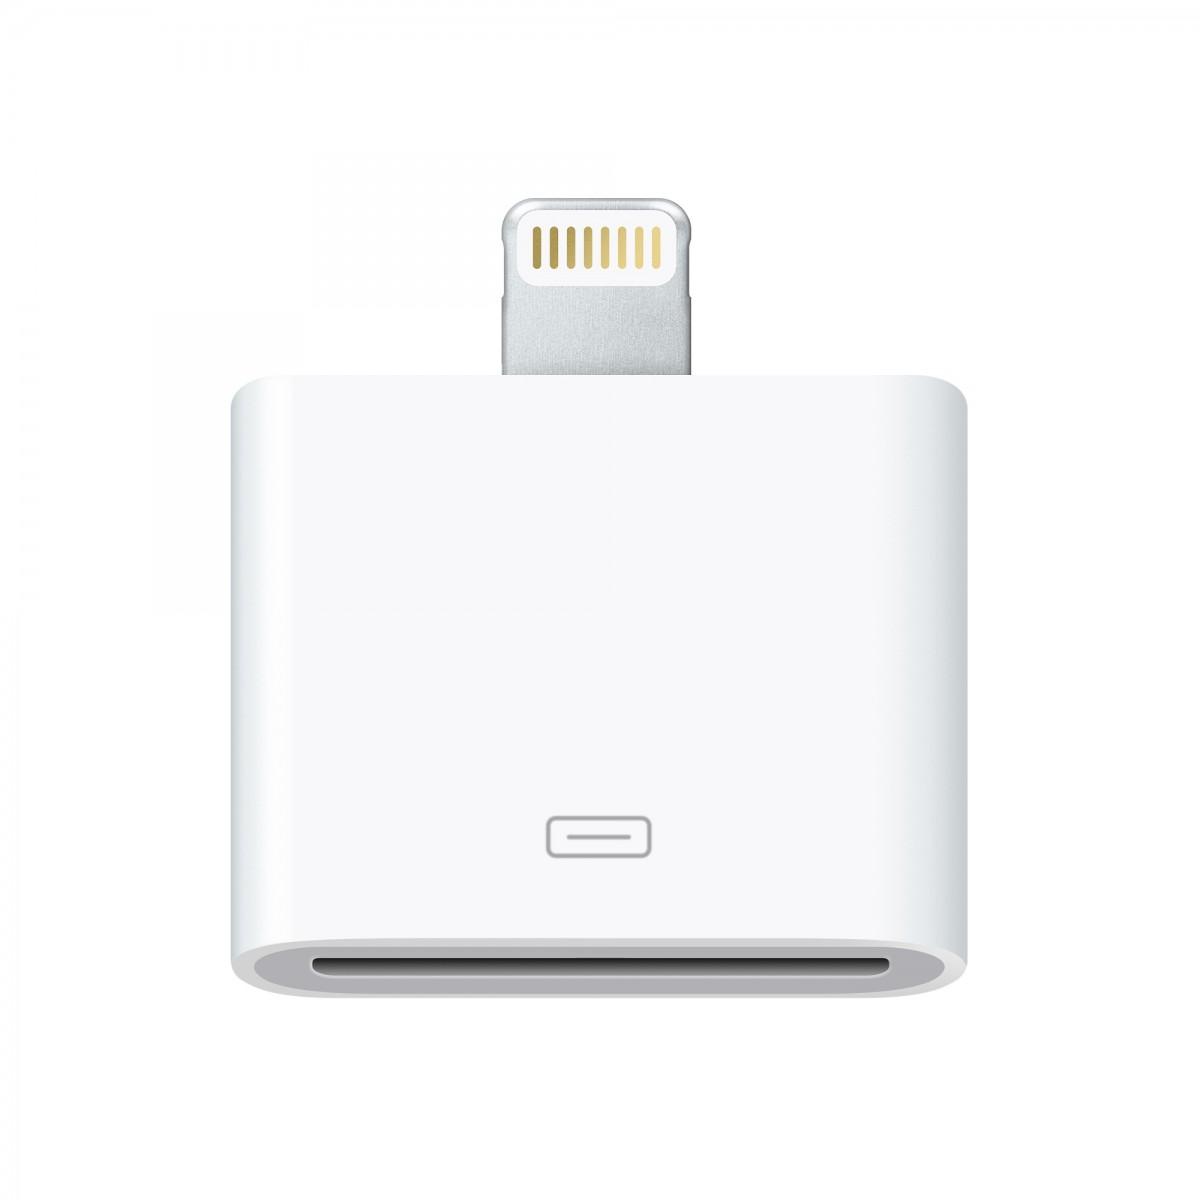 Adaptér / redukce z Apple 30pin na Lightning 8pin